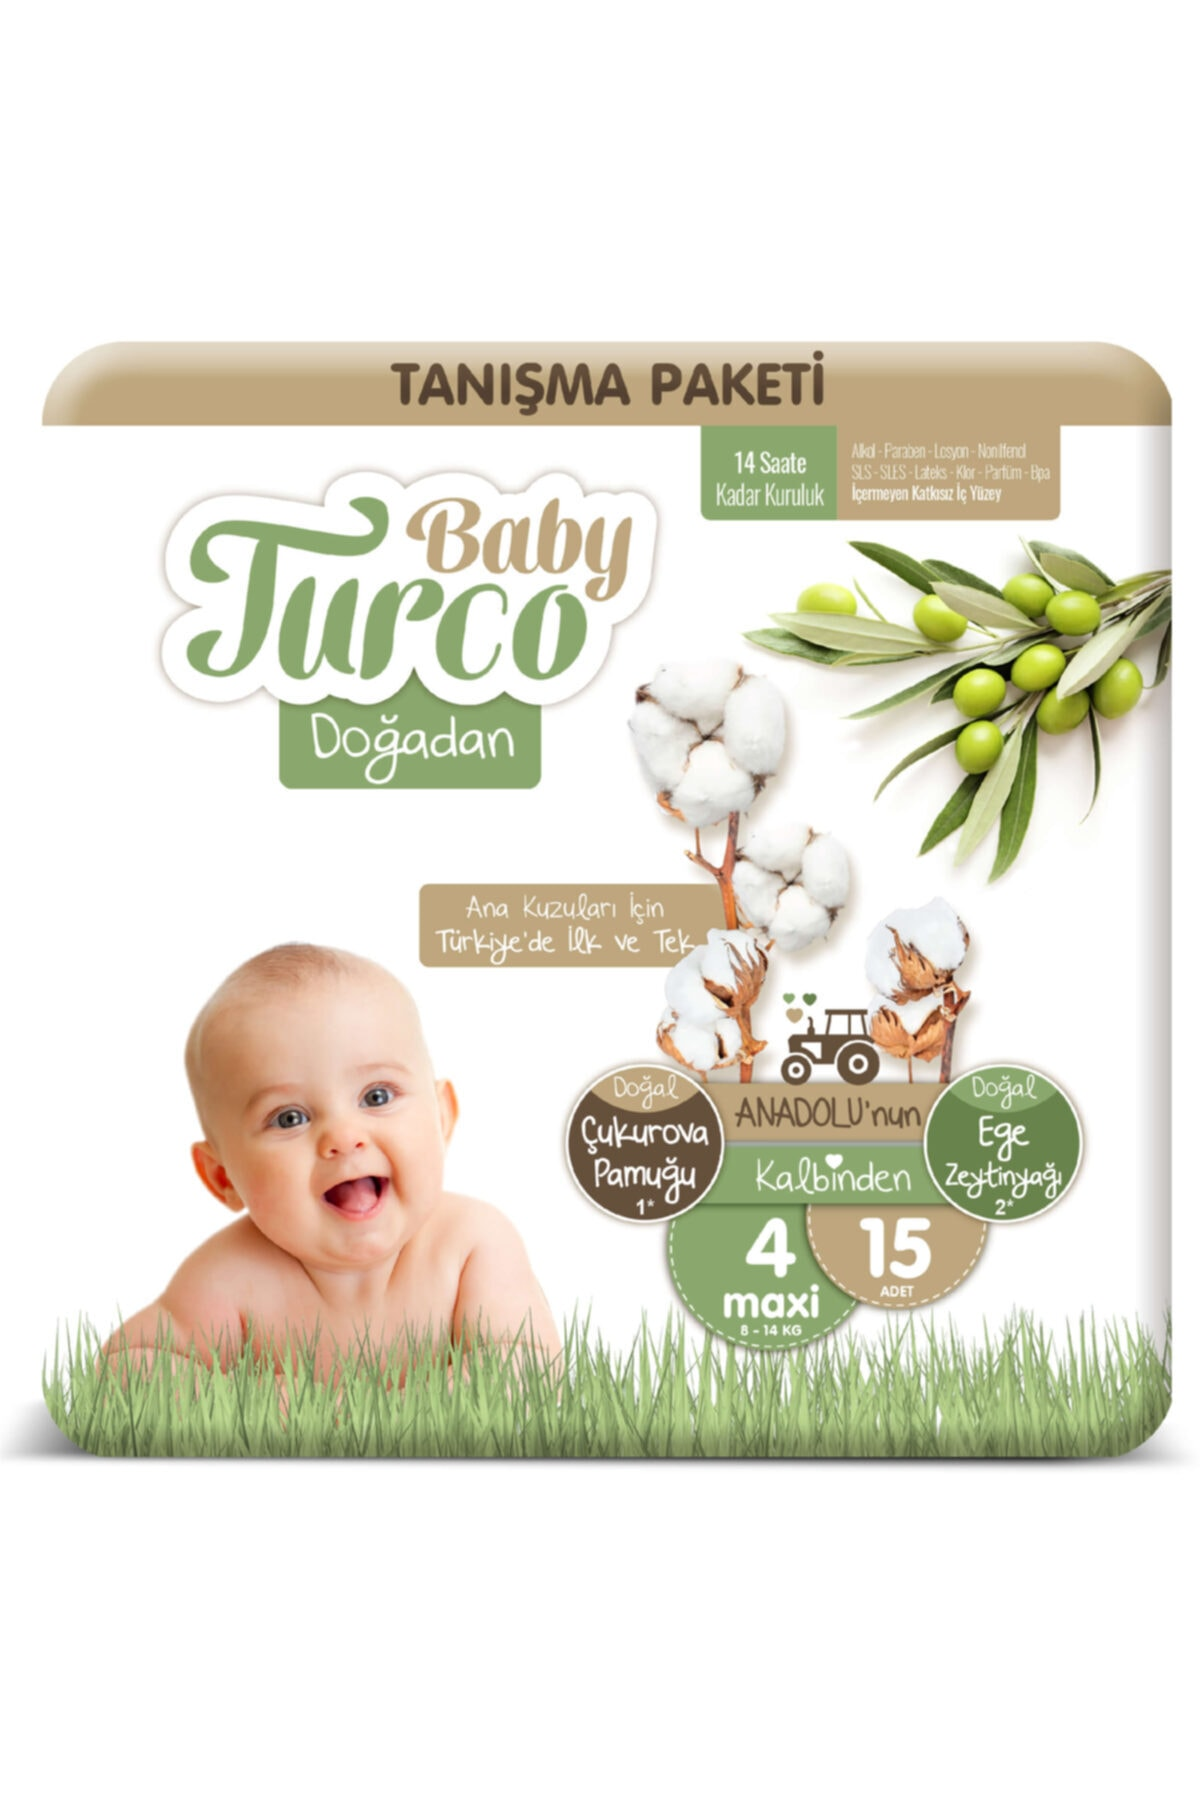 Baby Turco Doğadan 4 Numara Maxi Tanışma Paketi 15 Adet 1